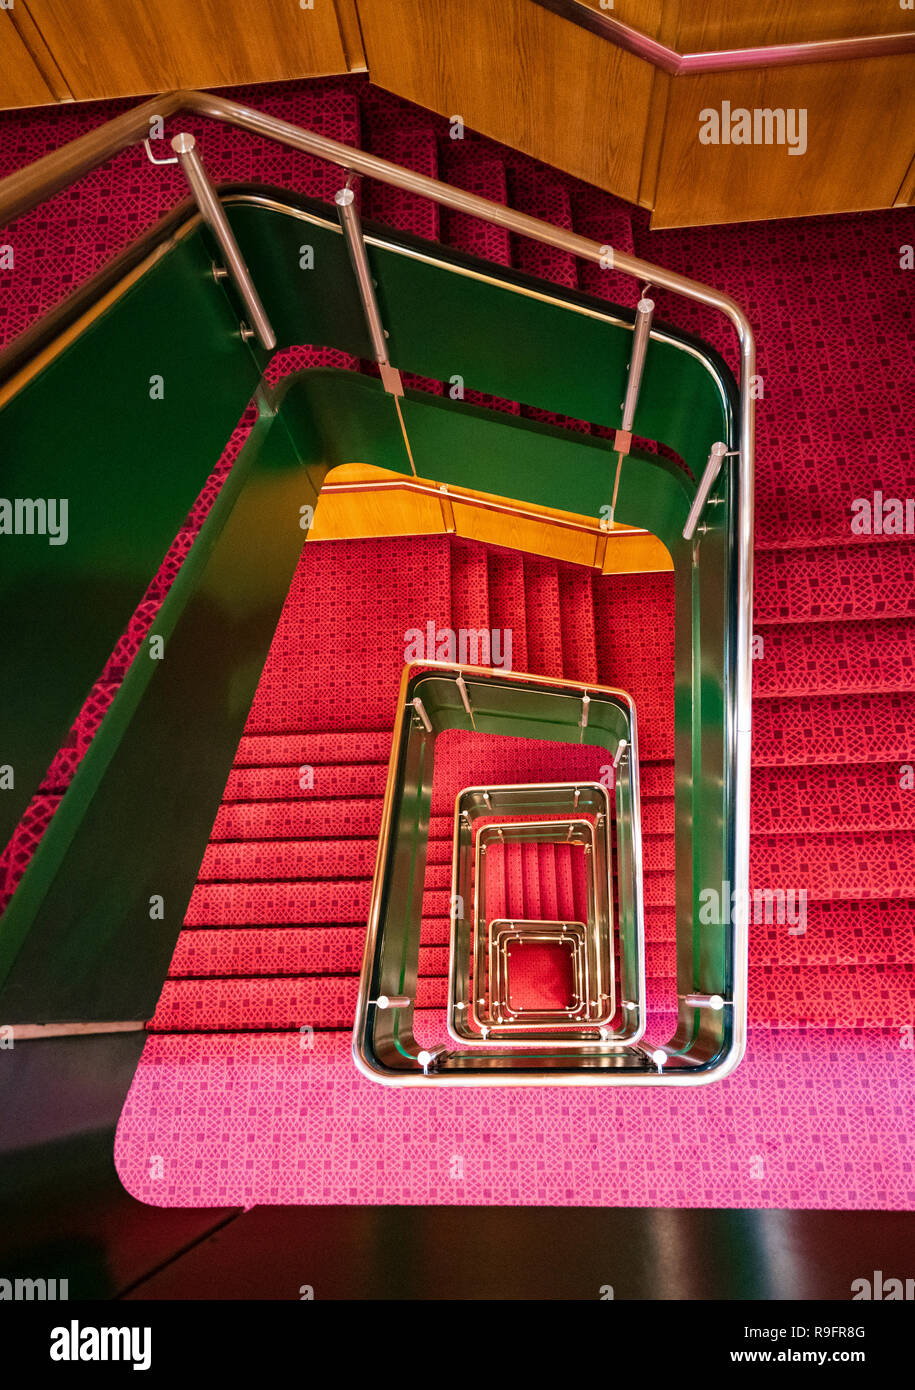 Stairway of Queen Elizabeth 2 former ocean liner now reopened as hotel in Dubai , United Arab Emirates - Stock Image